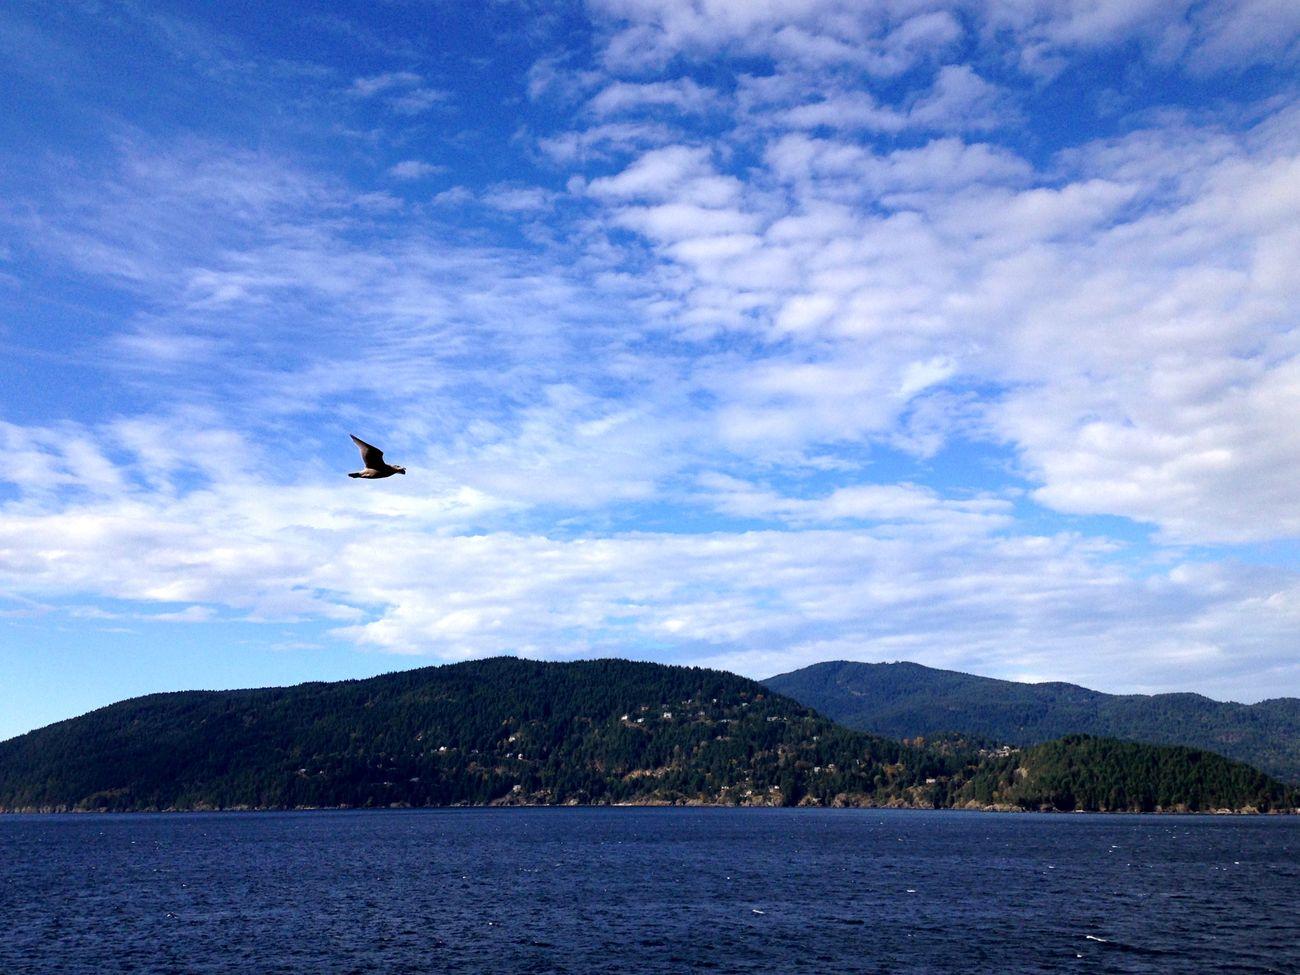 Sky Ocean Island Bird Flyingbird Nature Landscape Scenery Whytecliff Park Canada